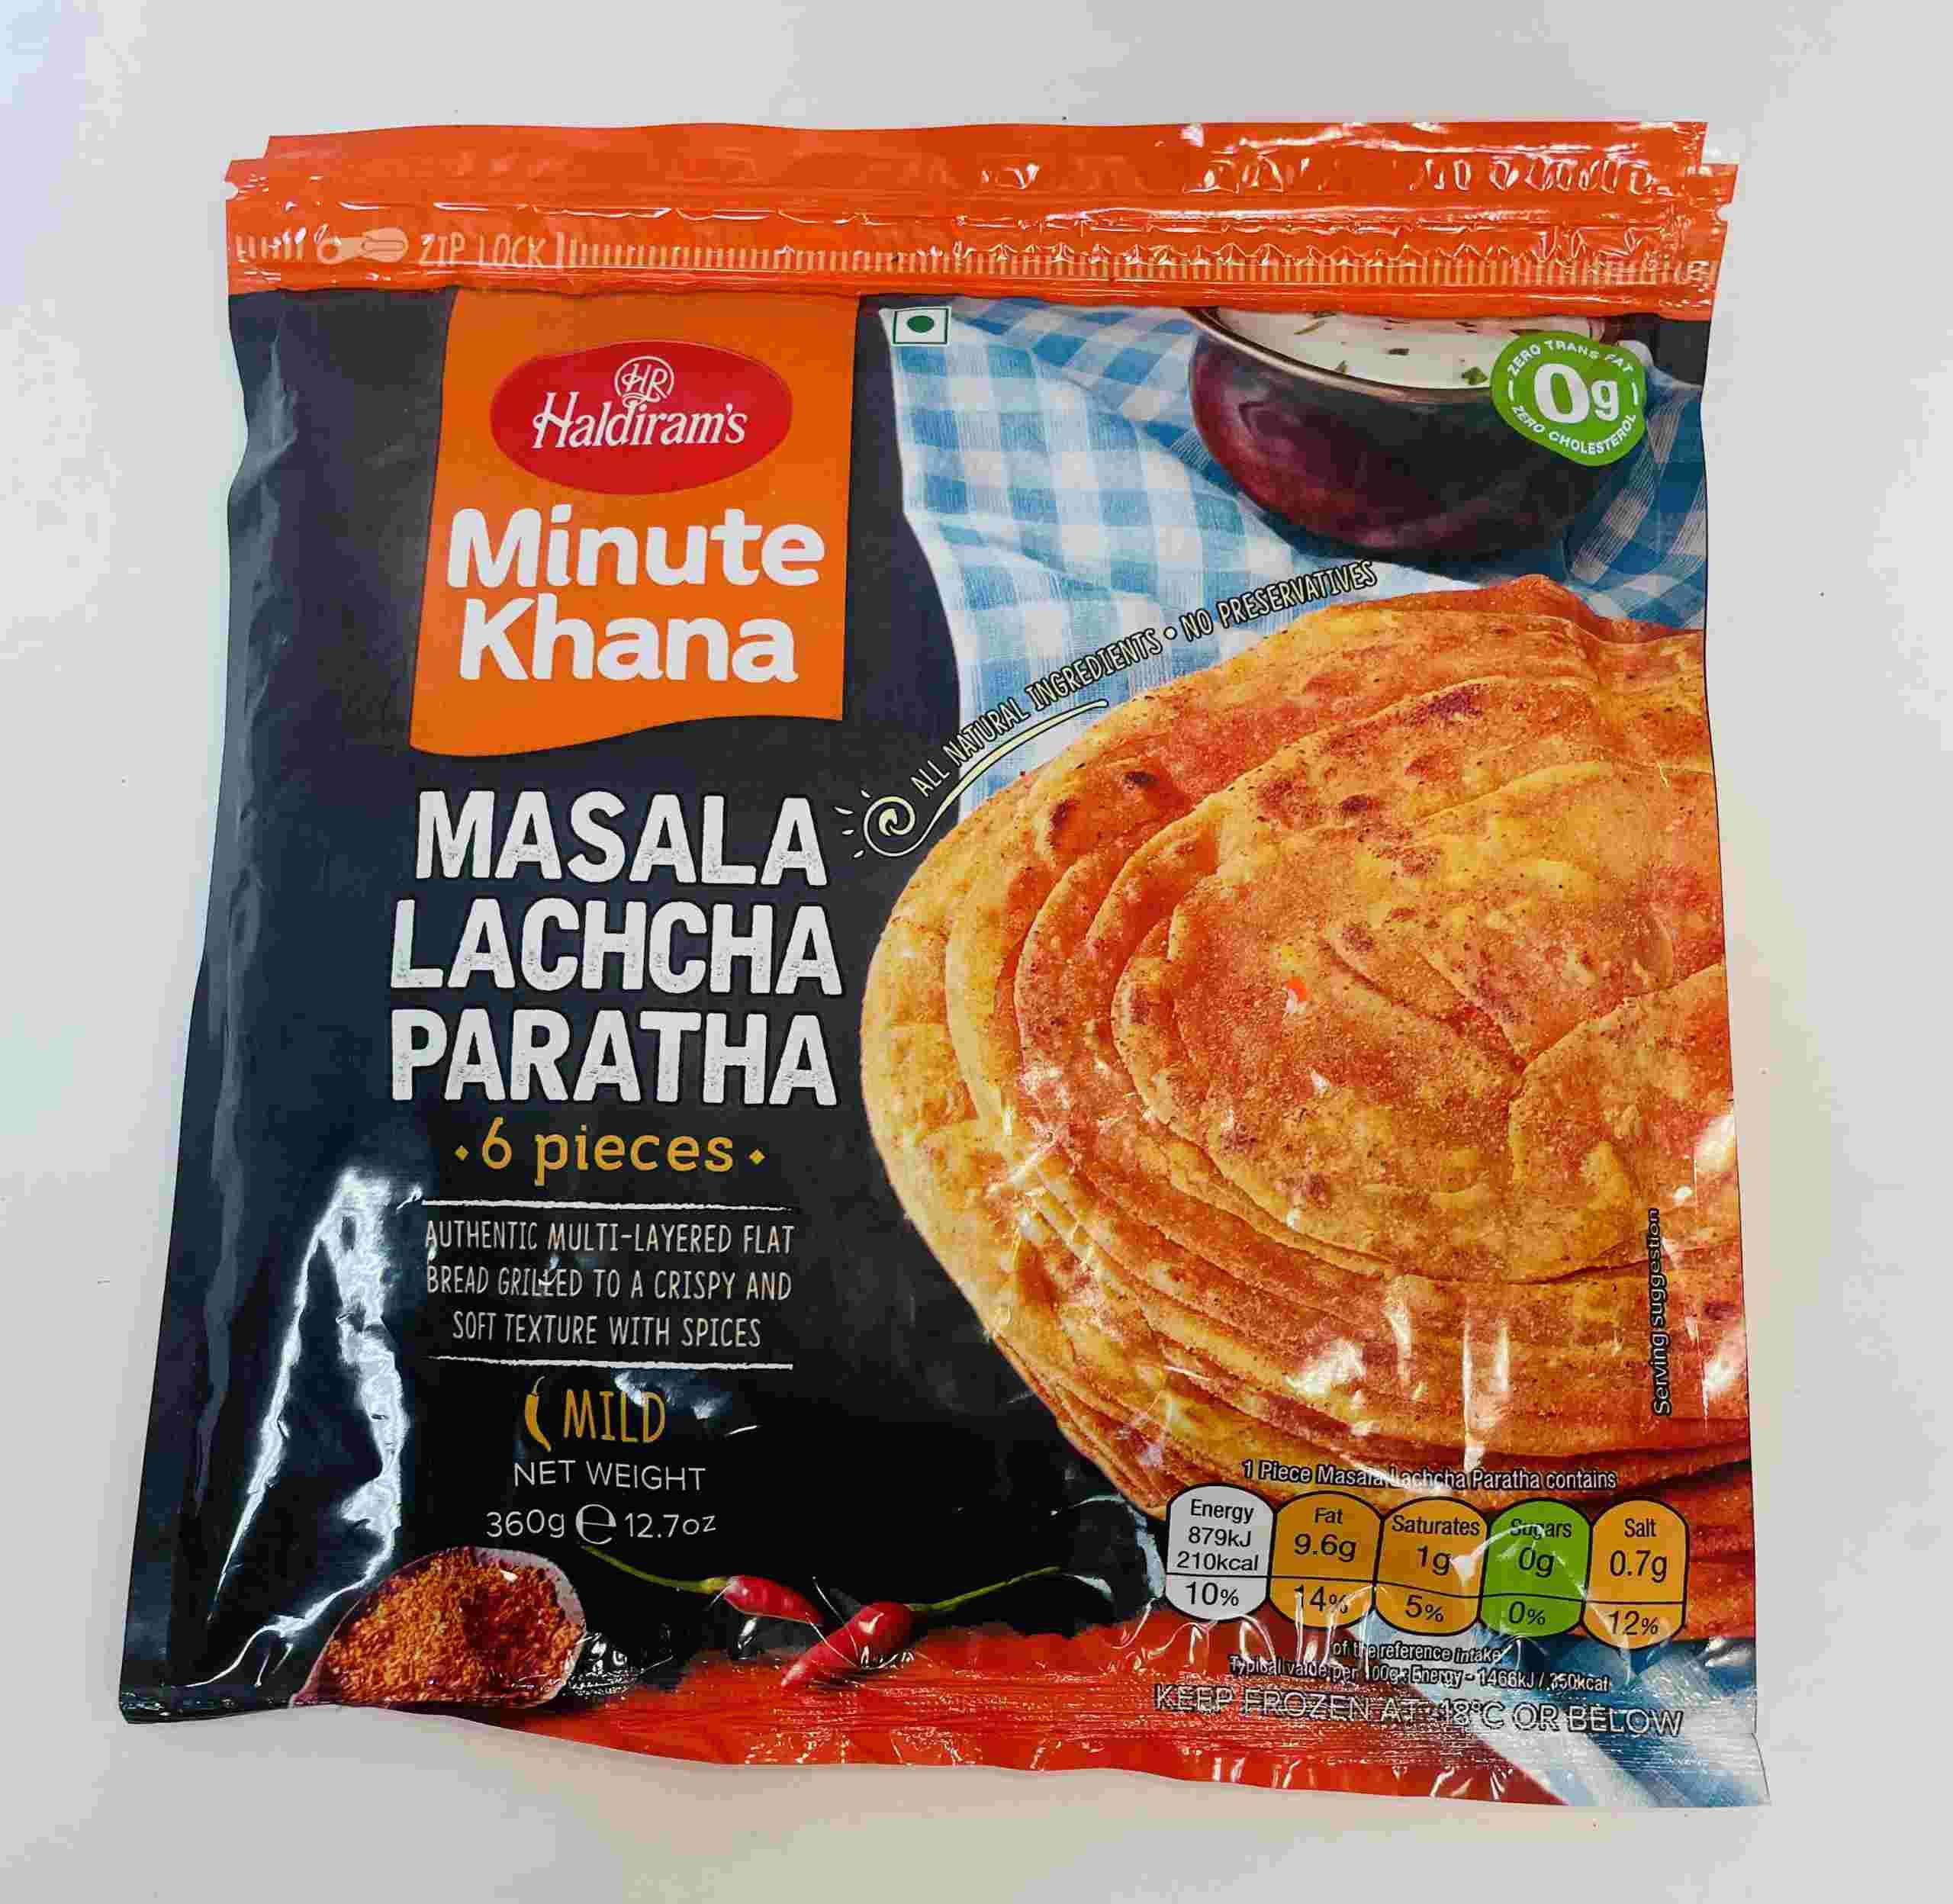 Haldiram's Masala Lachcha Paratha